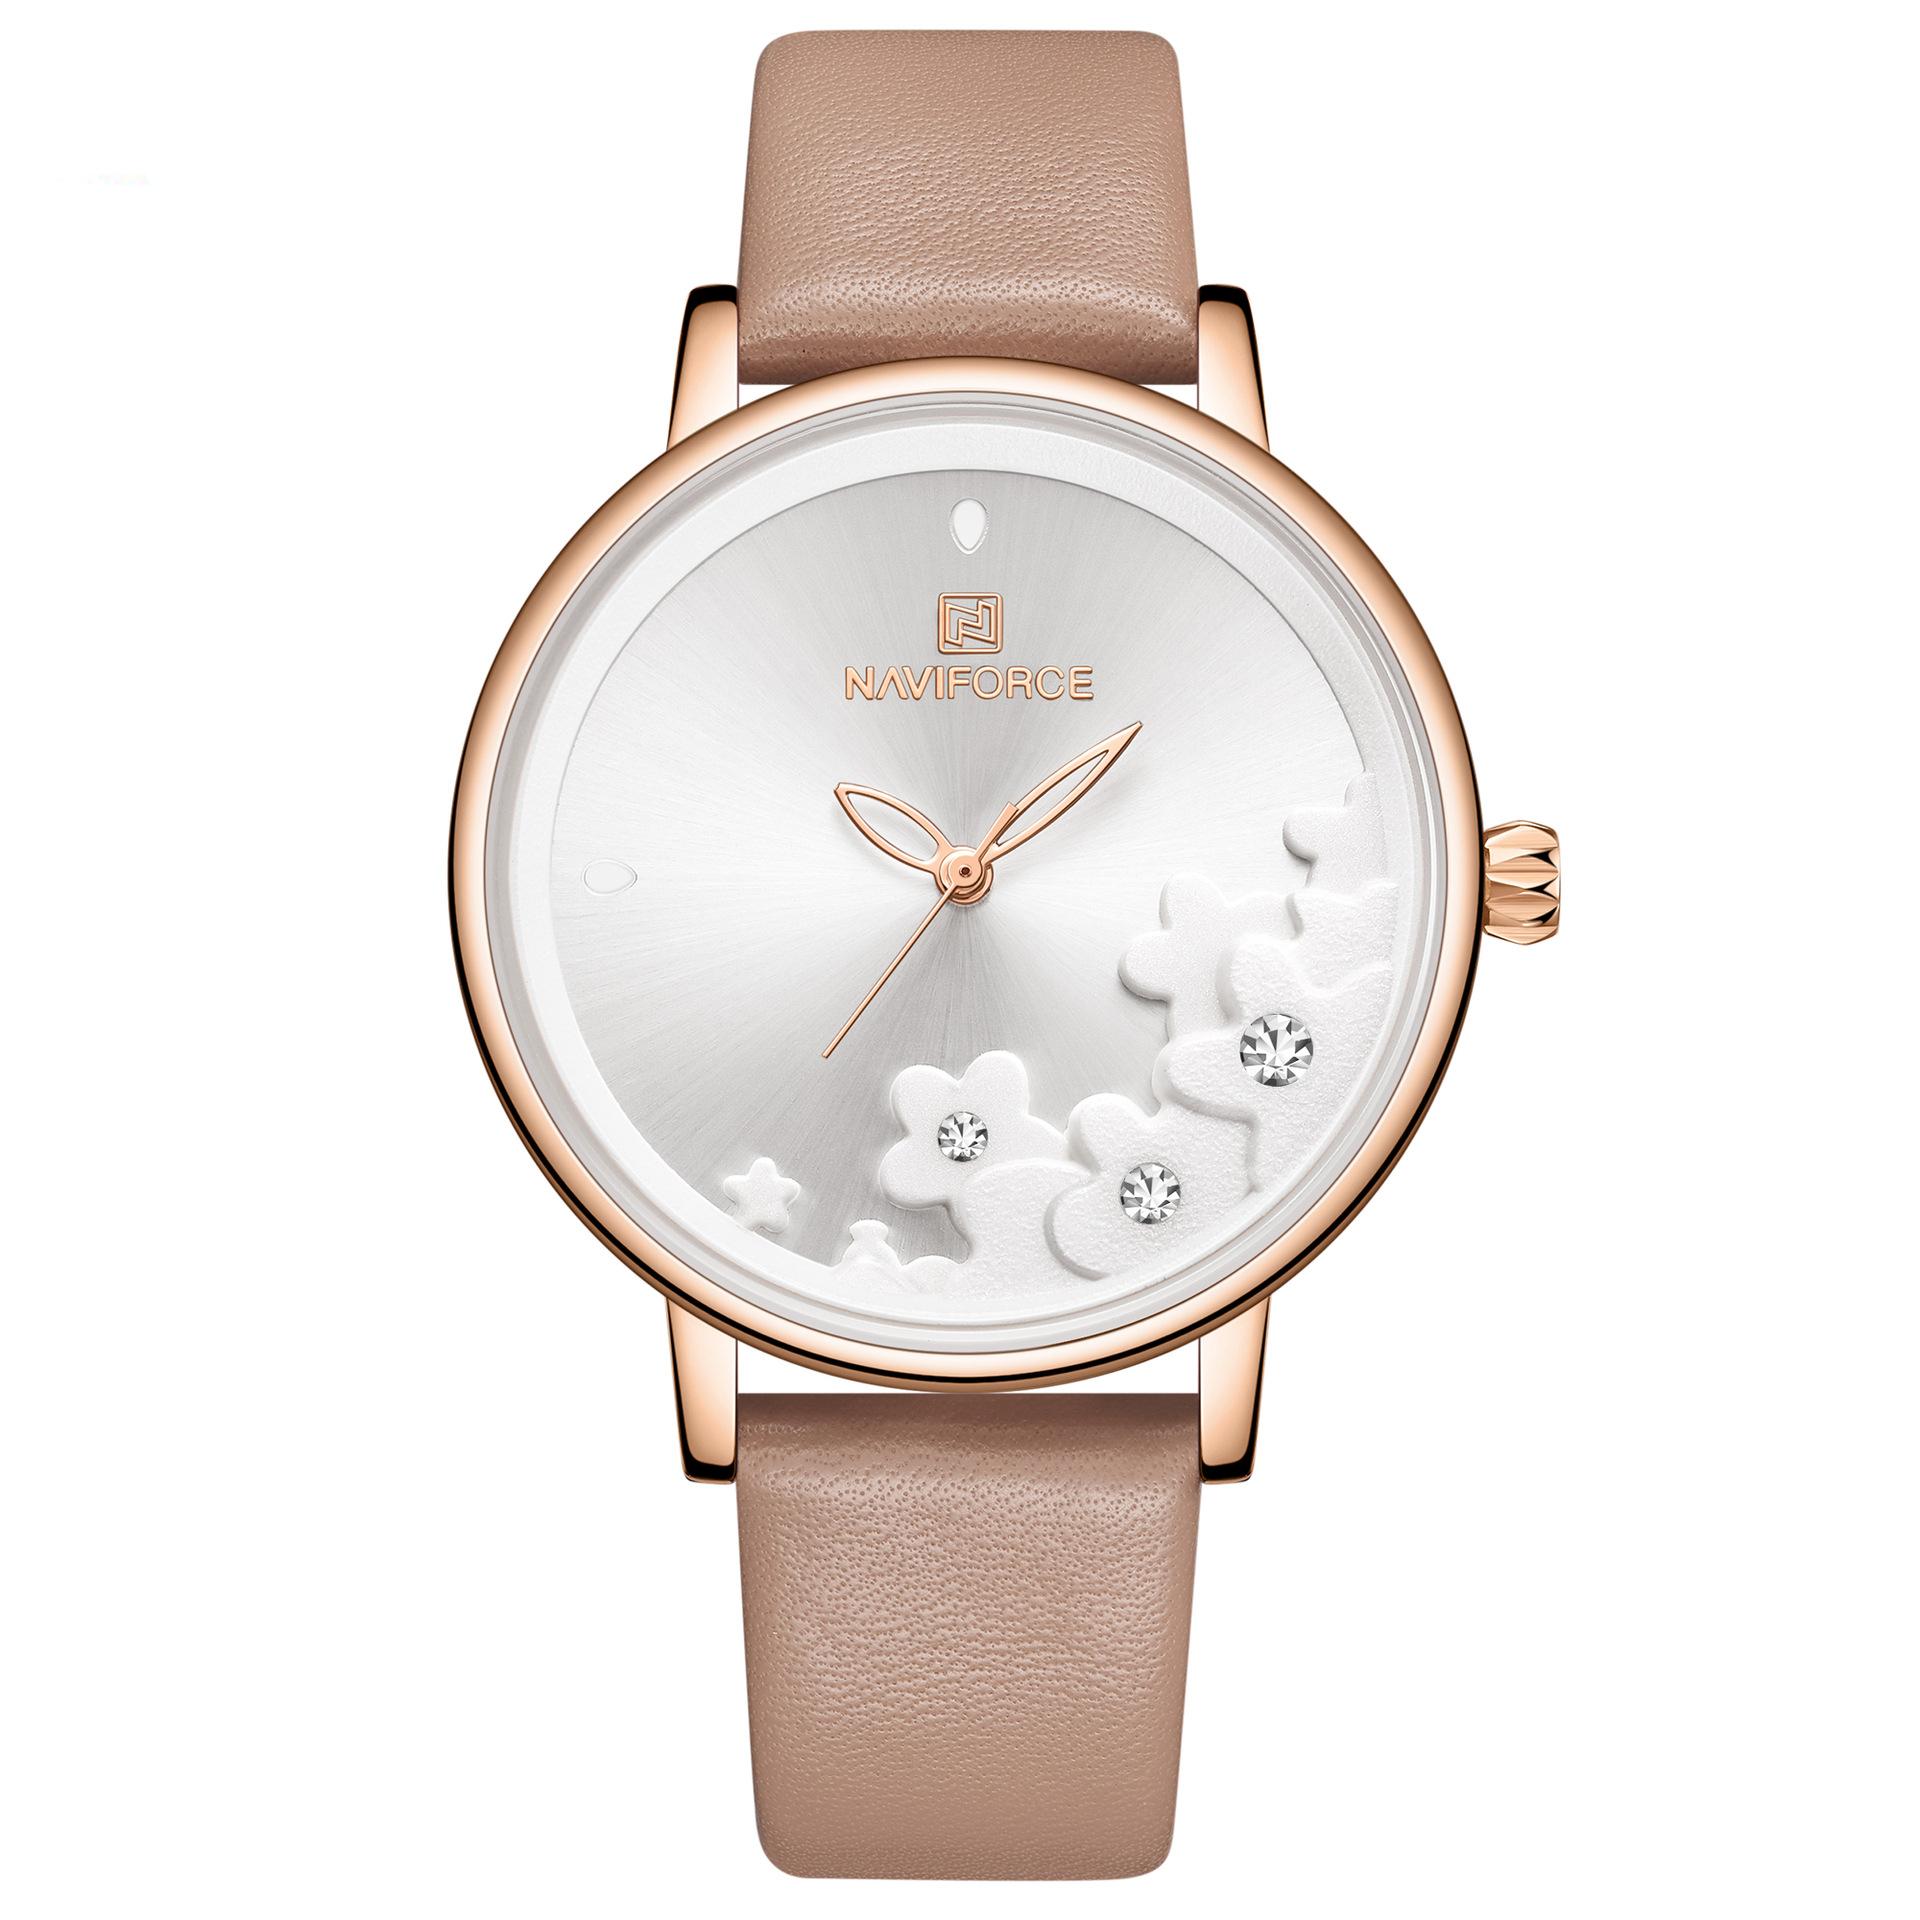 Naviforce Nf5012 Elegant Design Ladies Wrist Watch Waterproof Leather Band Quartz Watch Alexnld Com